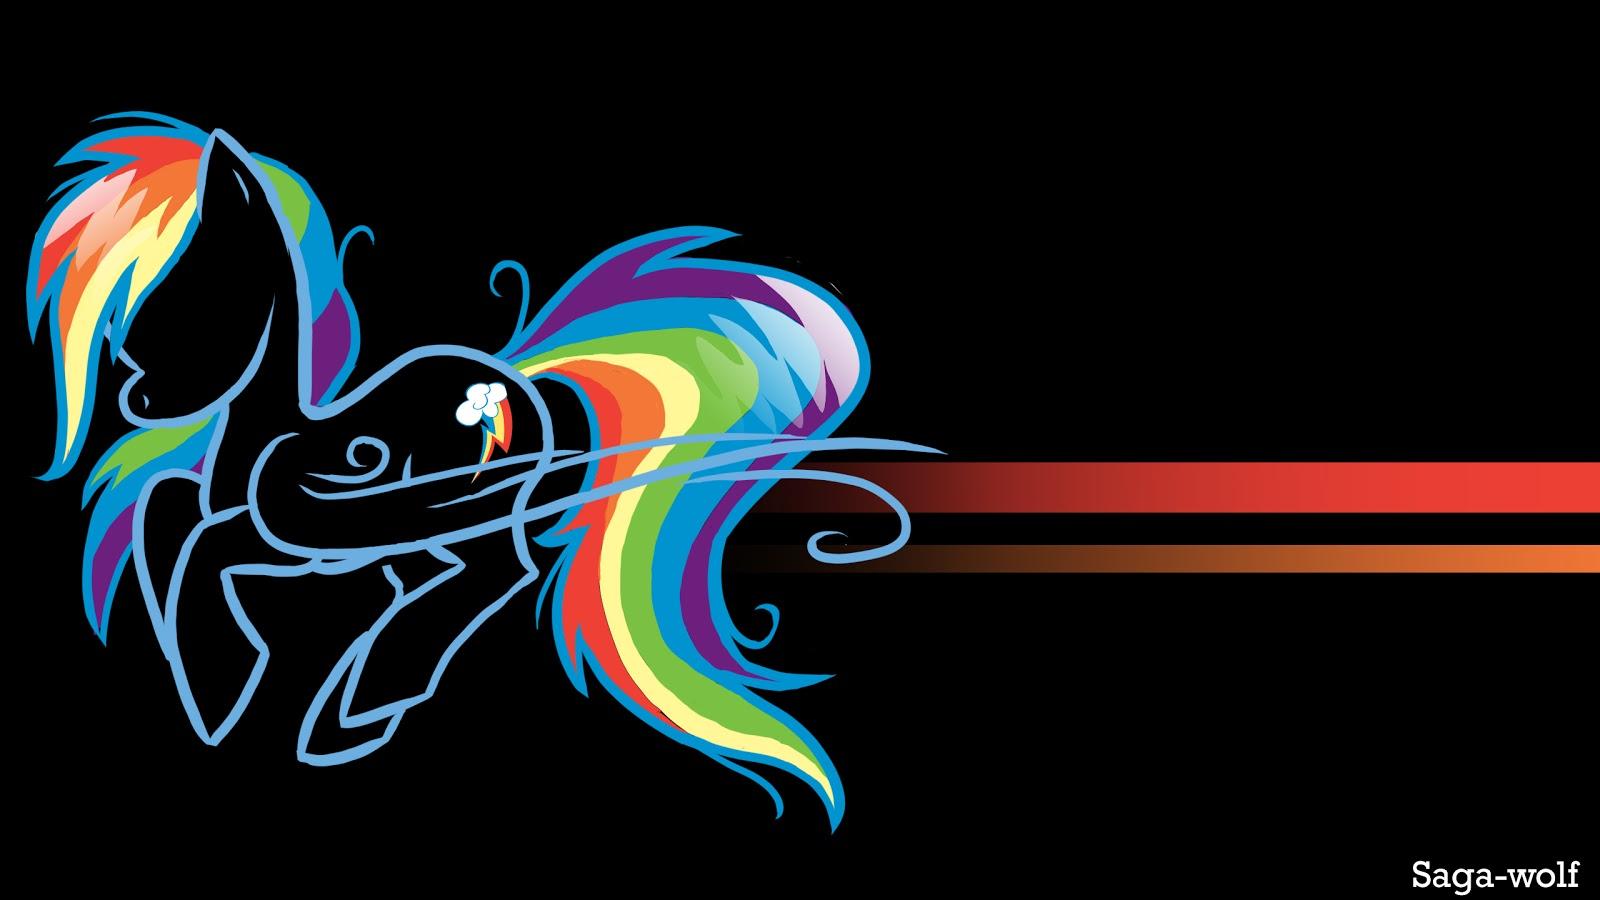 http://4.bp.blogspot.com/-CefyHfOUMzQ/UIlDL7ft6NI/AAAAAAAAApU/SzPS1tI1wfA/s1600/rainbow_dash_wallpaper_by_saga_wolf-d4f9eqn.jpg